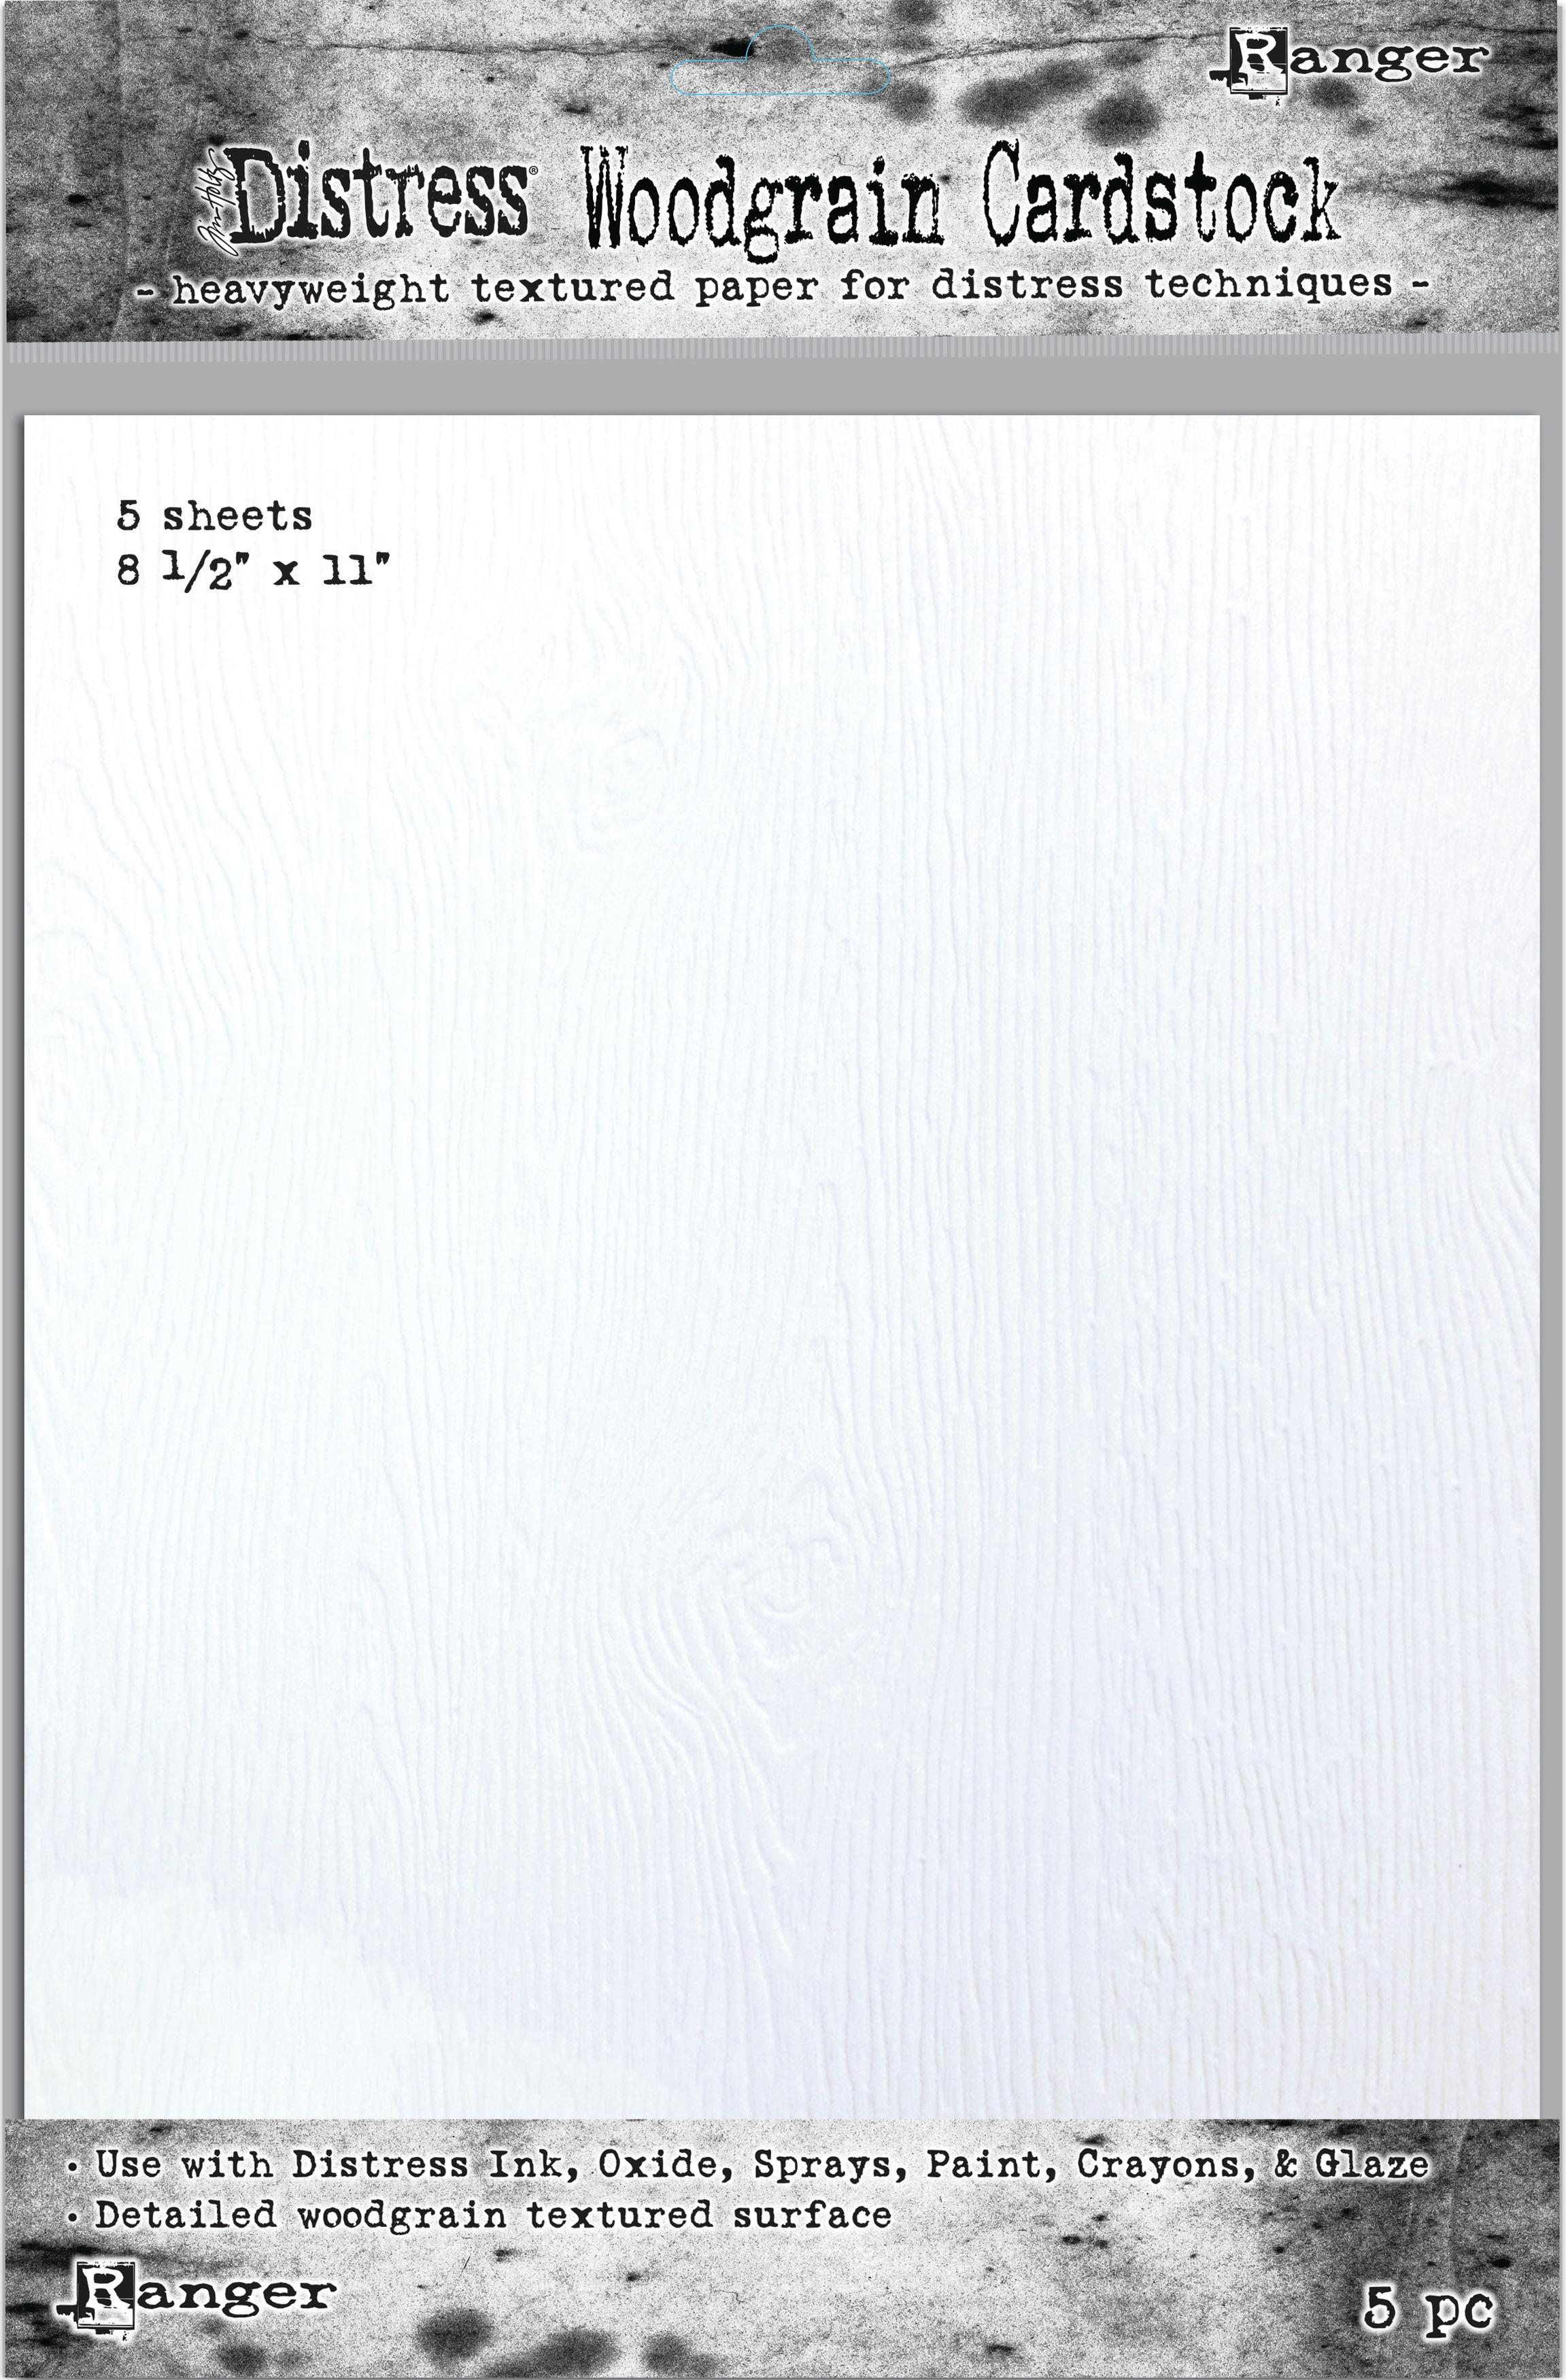 Distress Woodgrain Cardstock 4.25x5.5 12pk